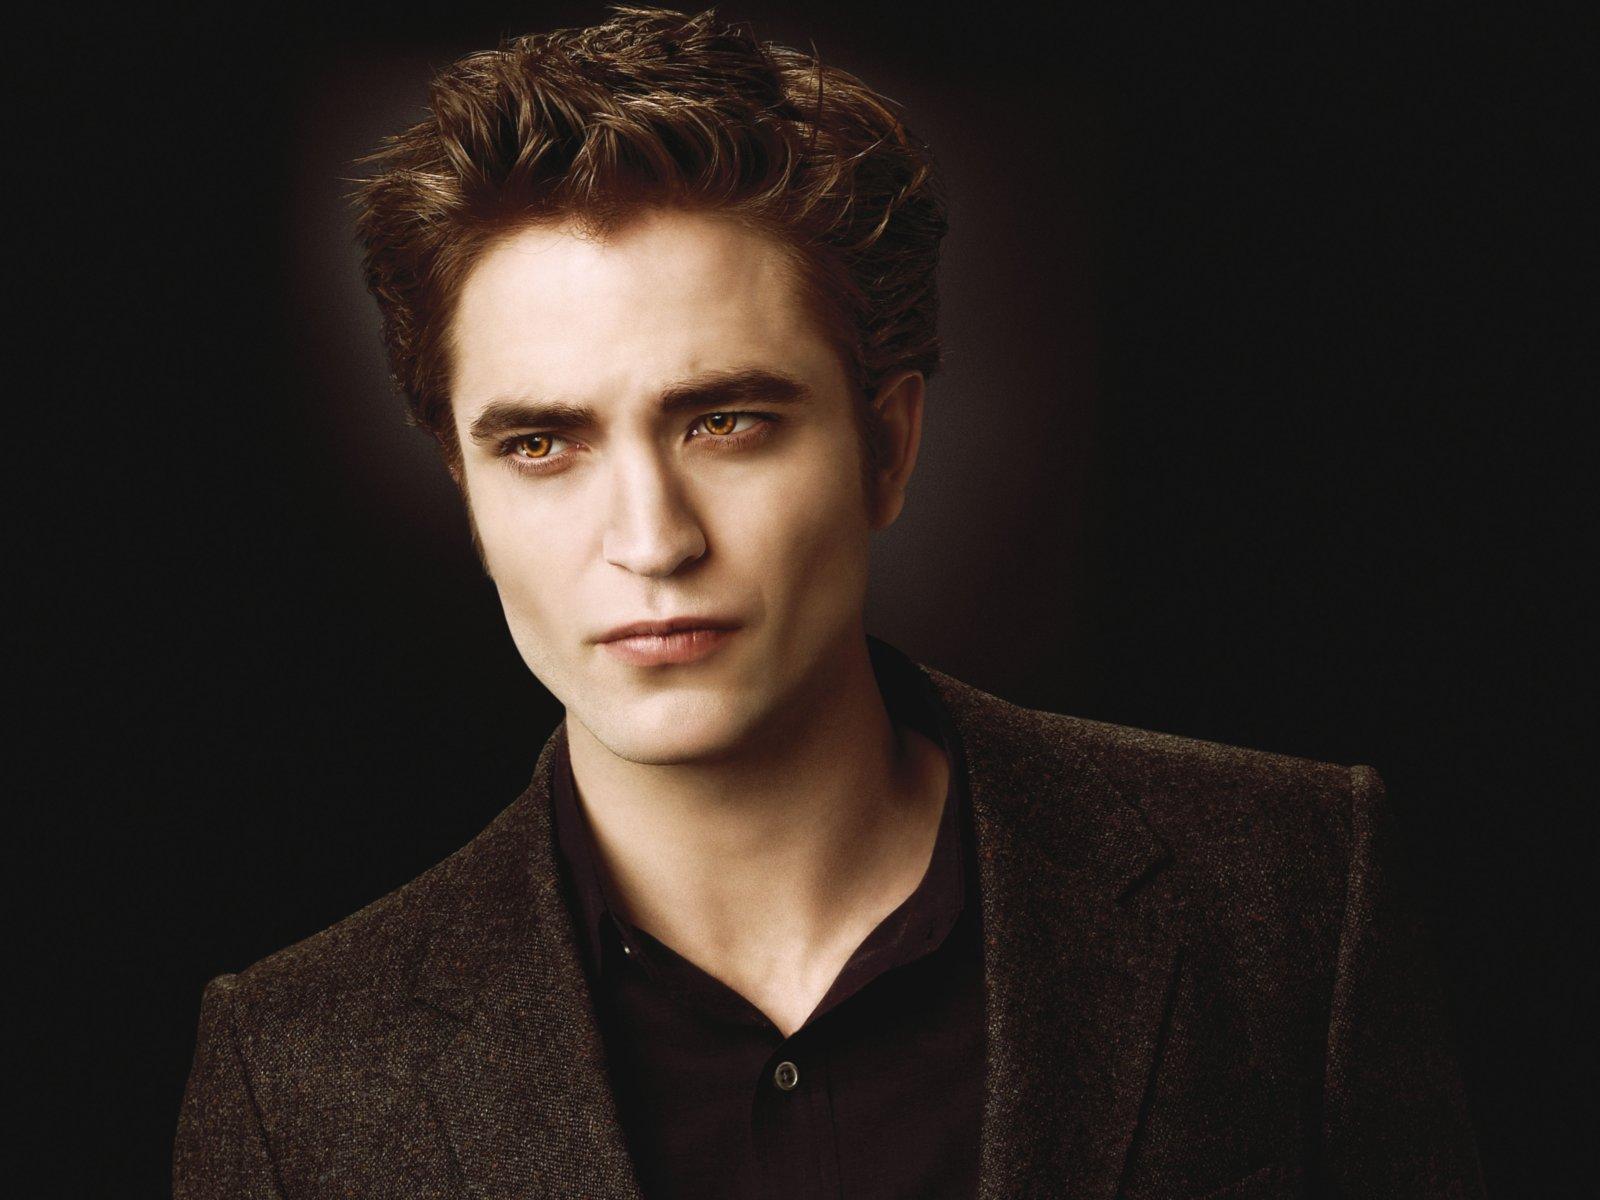 Robert Pattinson crepusculo